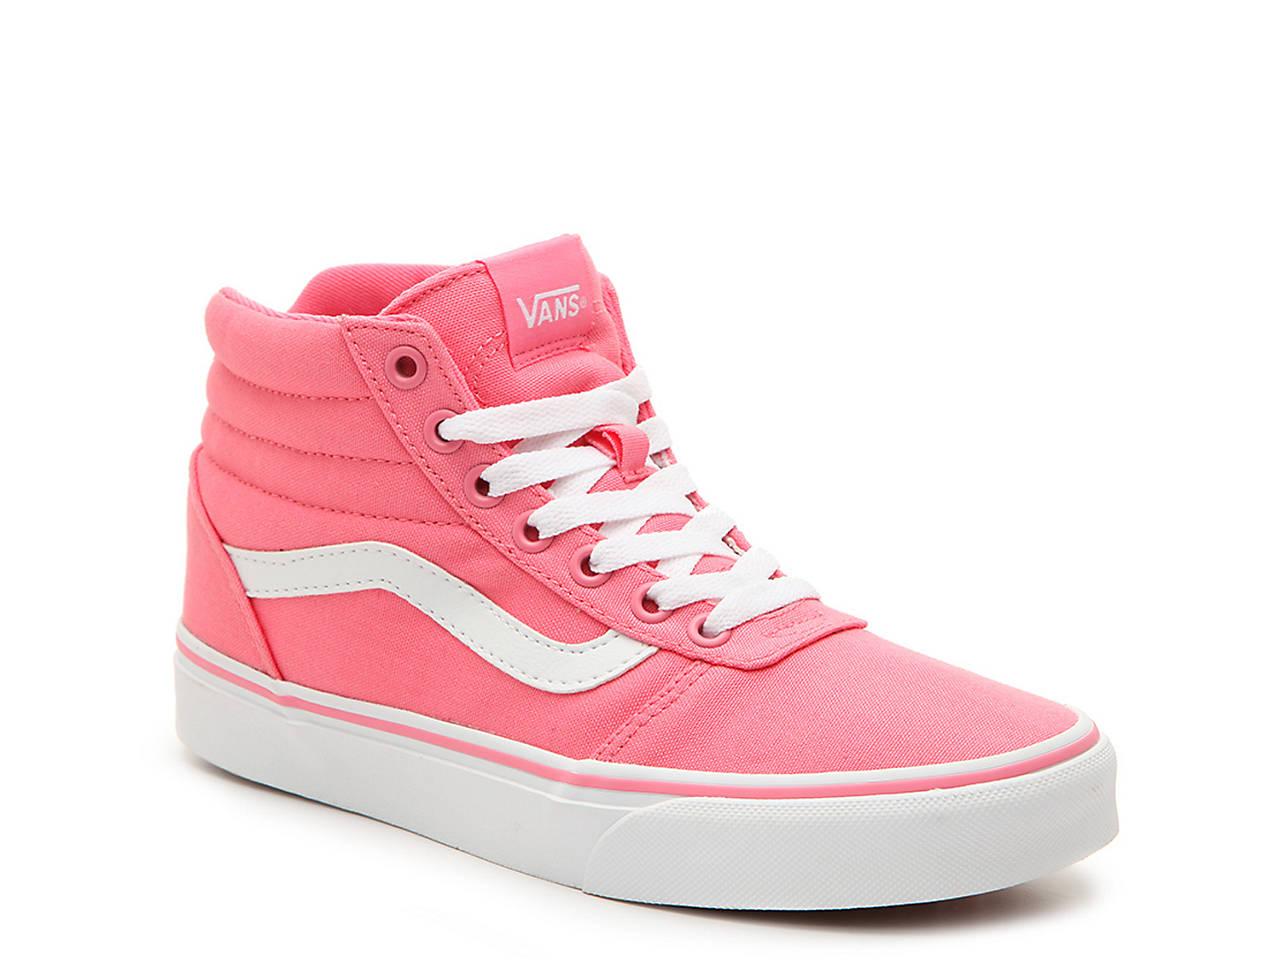 67abb30bfca6 Vans Ward High-Top Sneaker - Women s Women s Shoes